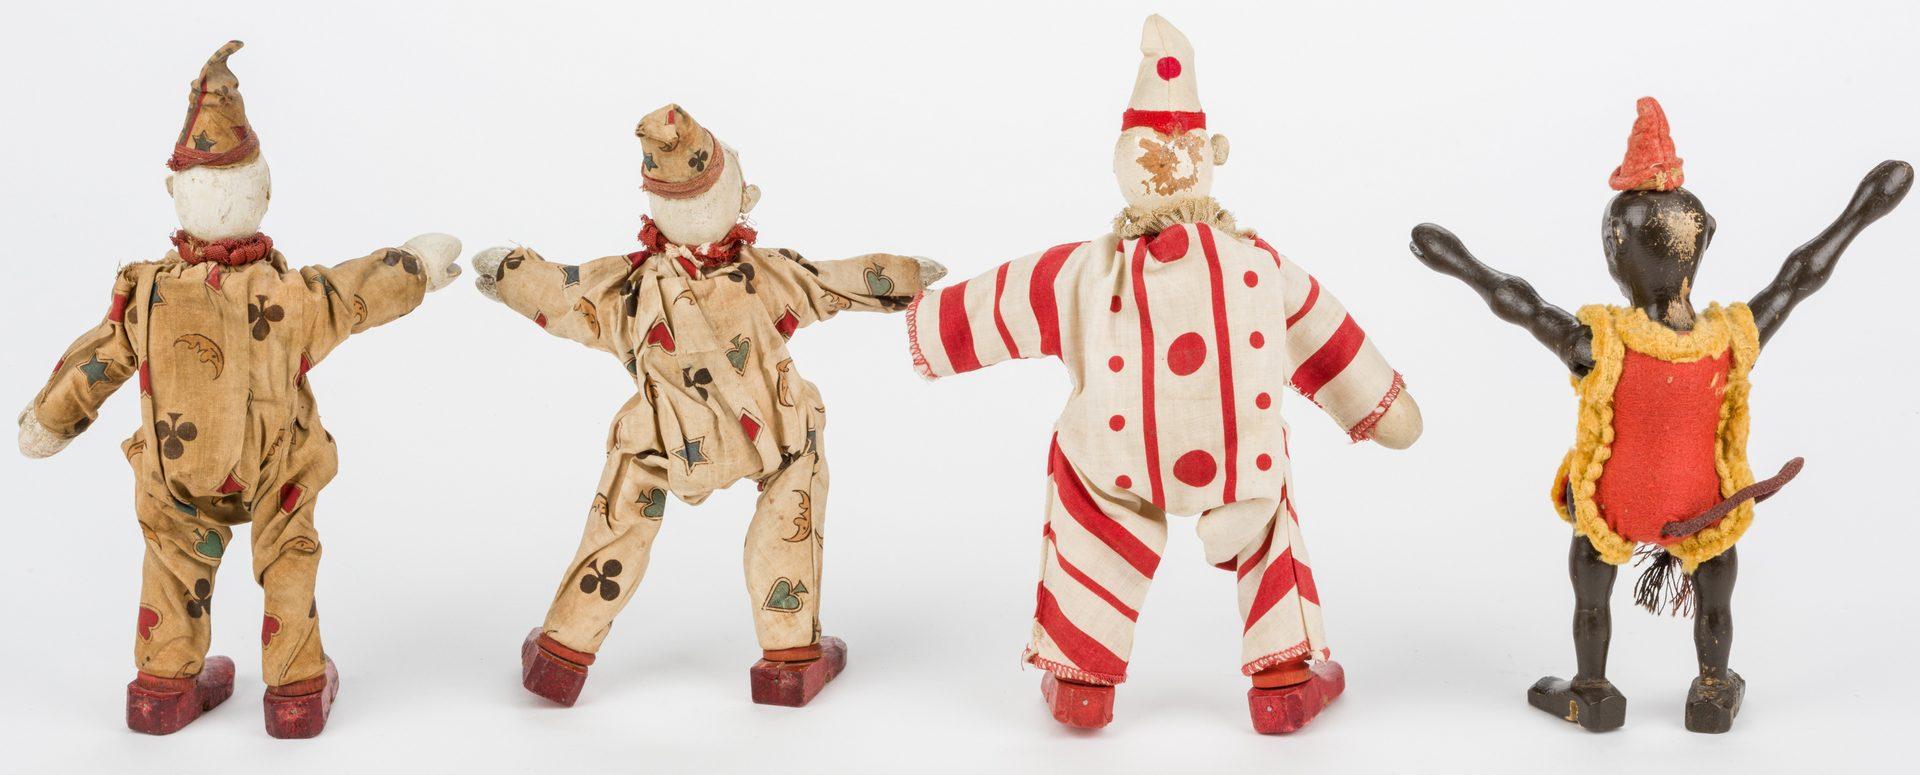 Lot 821: Schoenhut Circus Figures, Animals, & Accessories, 21 pcs